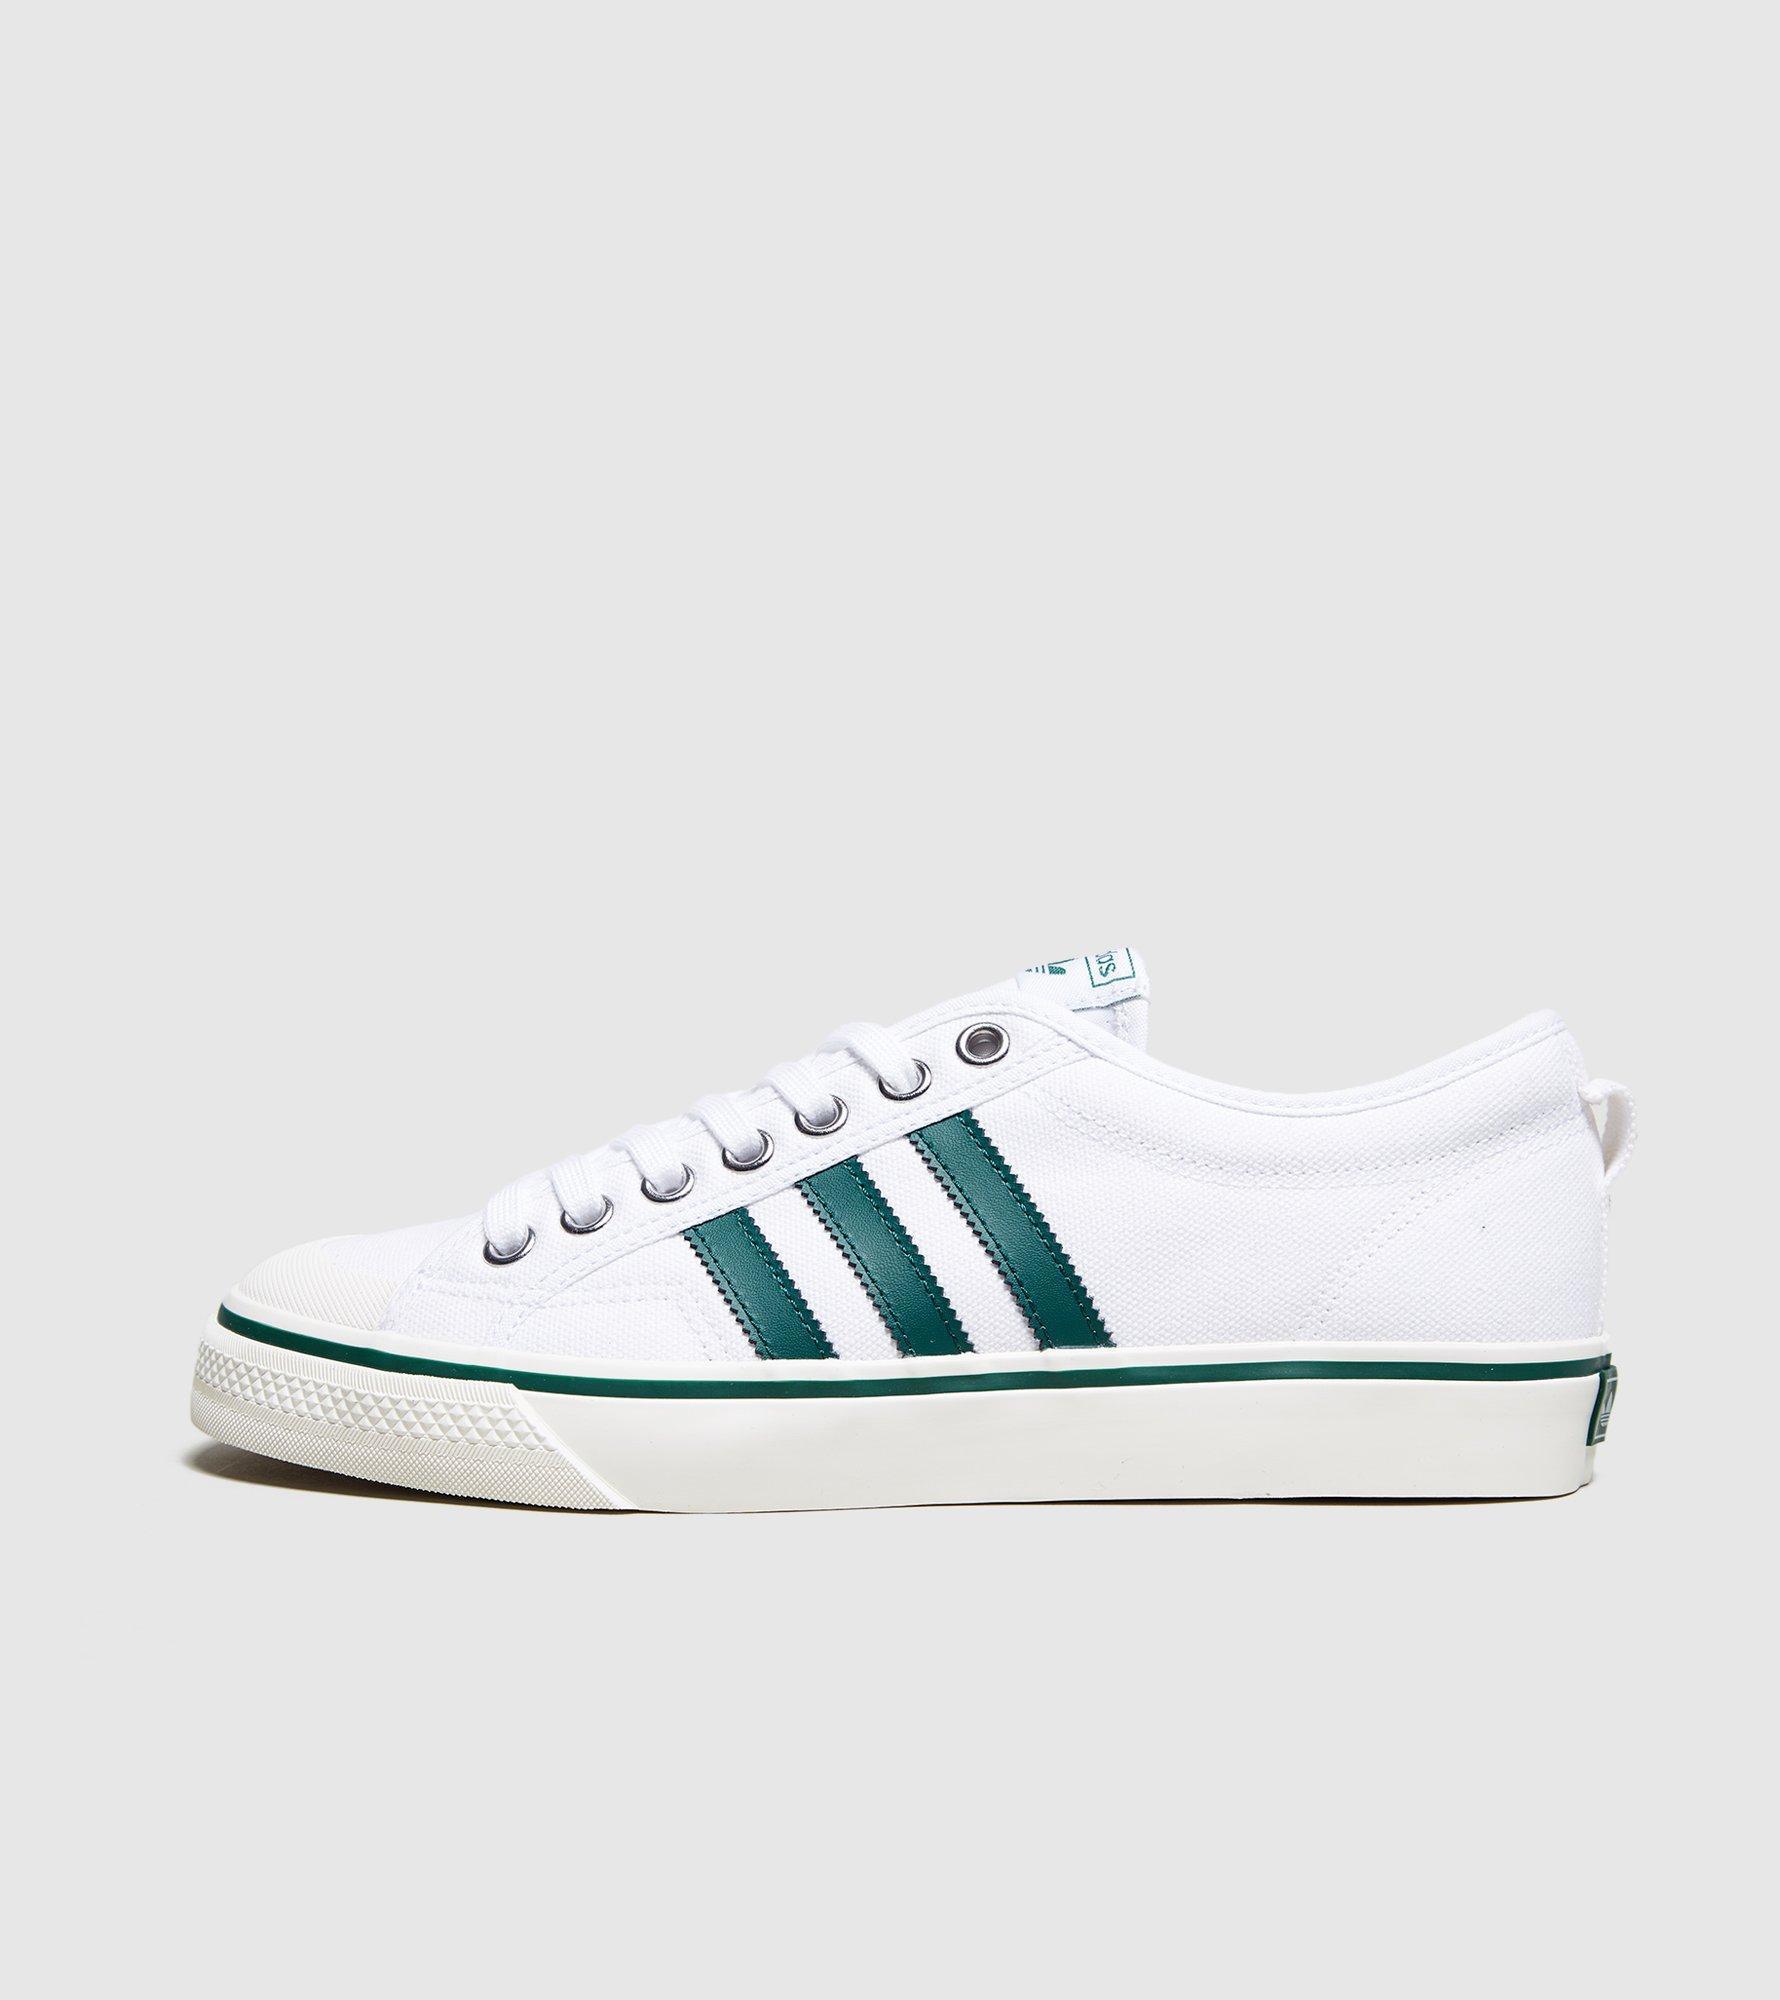 Lyst - Adidas Originals Nizza Lo in White for Men 02a624a3b